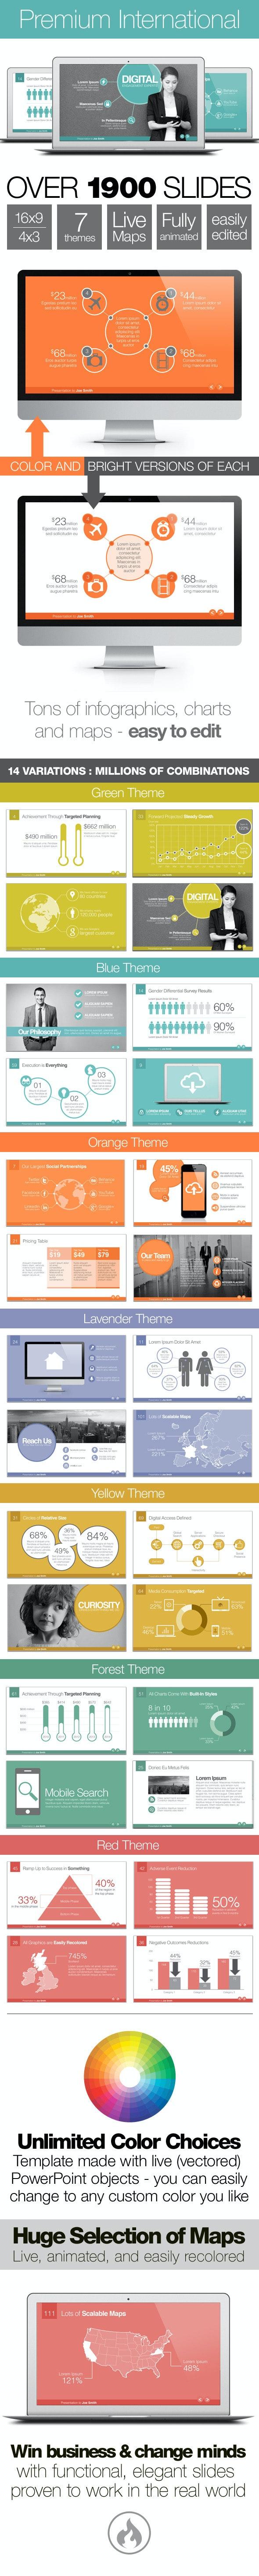 Premium International Template System - Business PowerPoint Templates